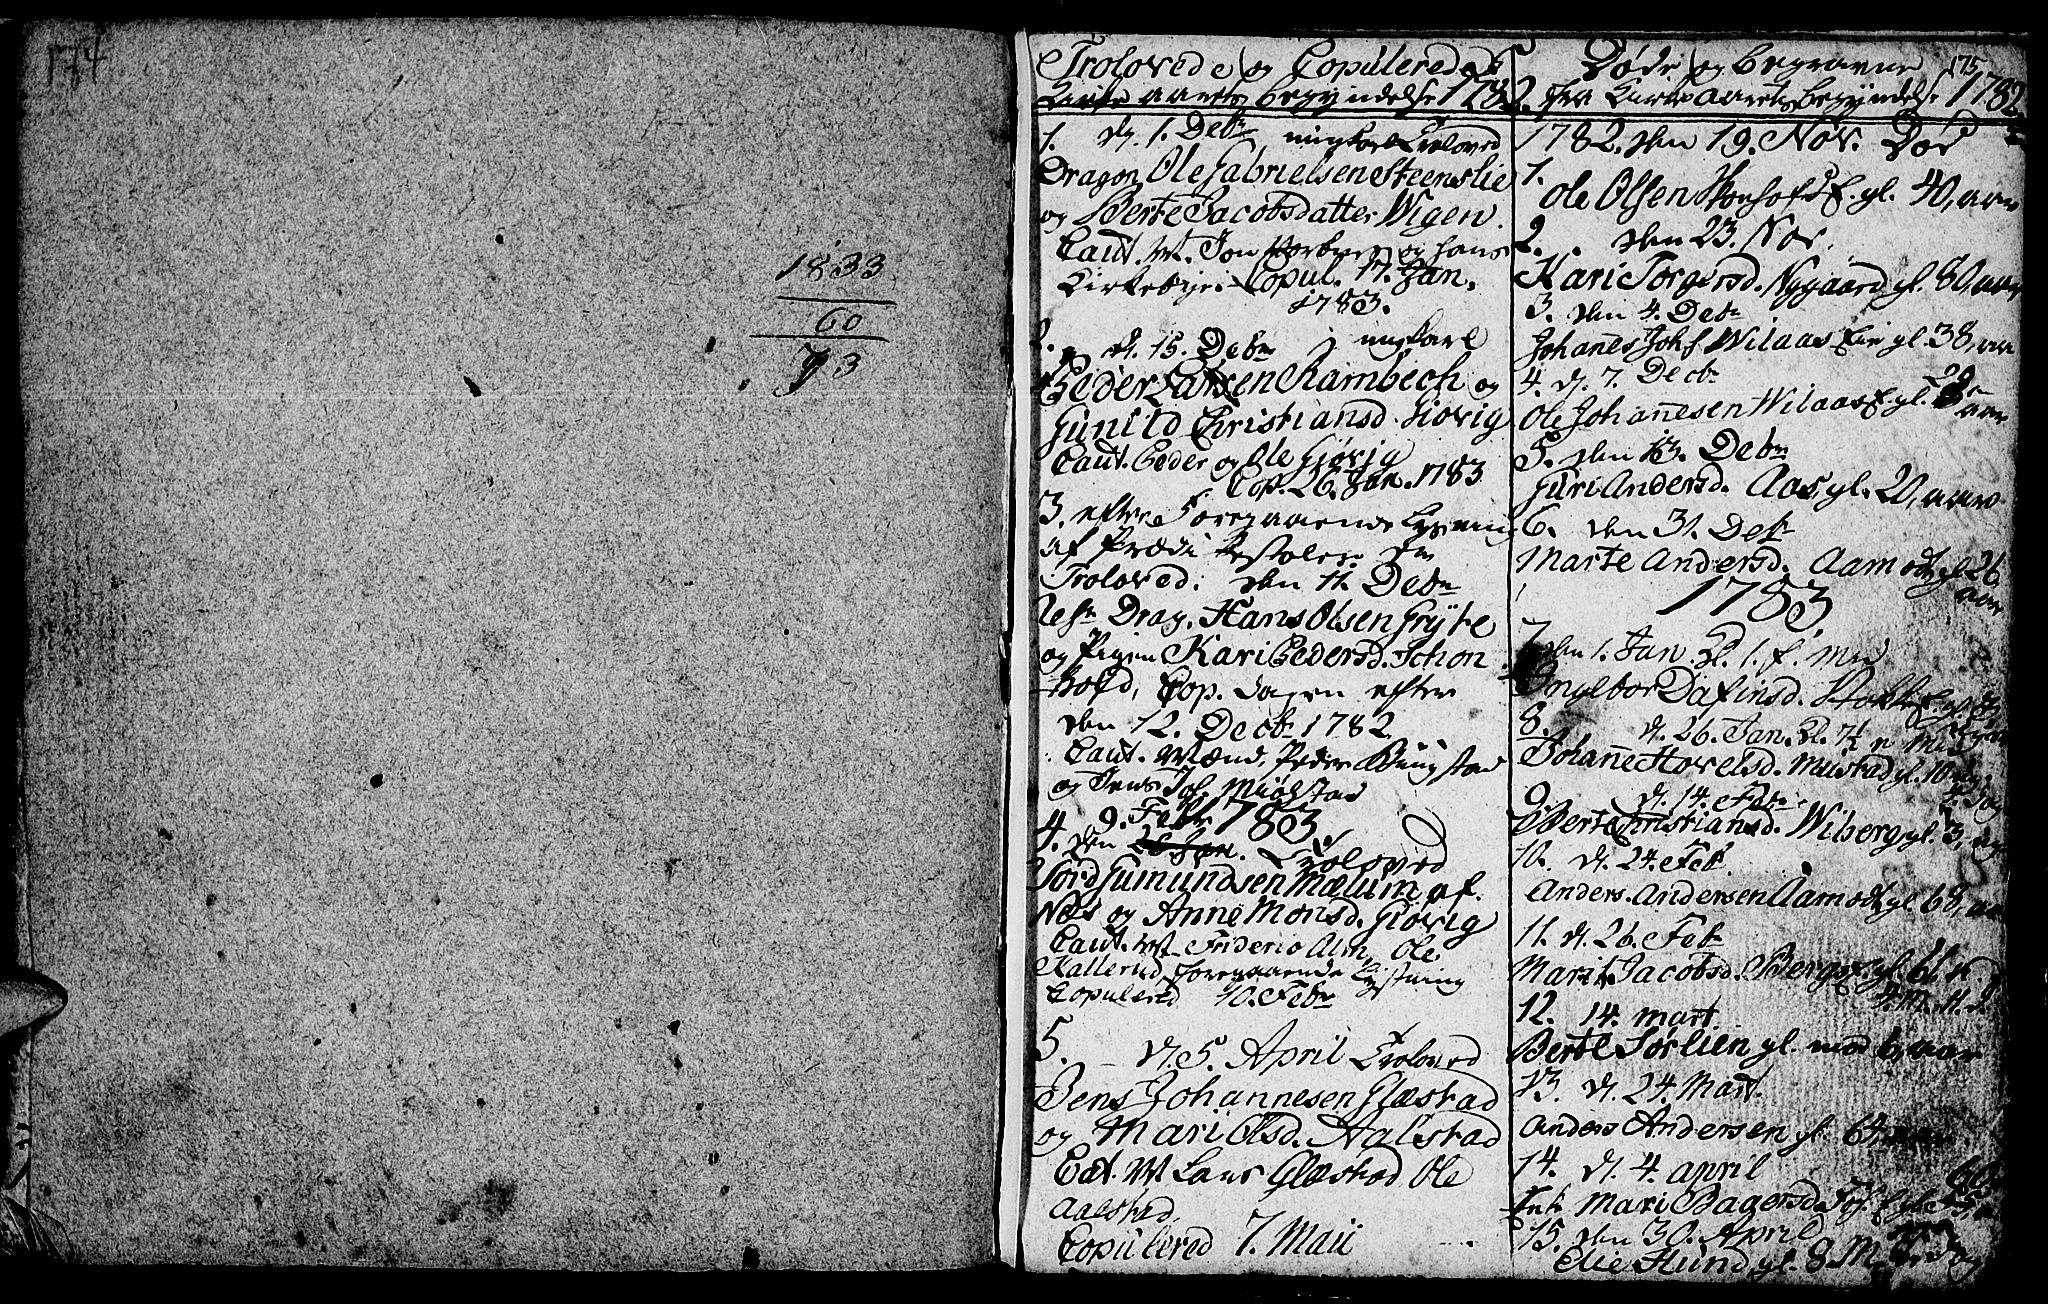 SAH, Vardal prestekontor, H/Ha/Hab/L0001: Klokkerbok nr. 1, 1771-1790, s. 174-175